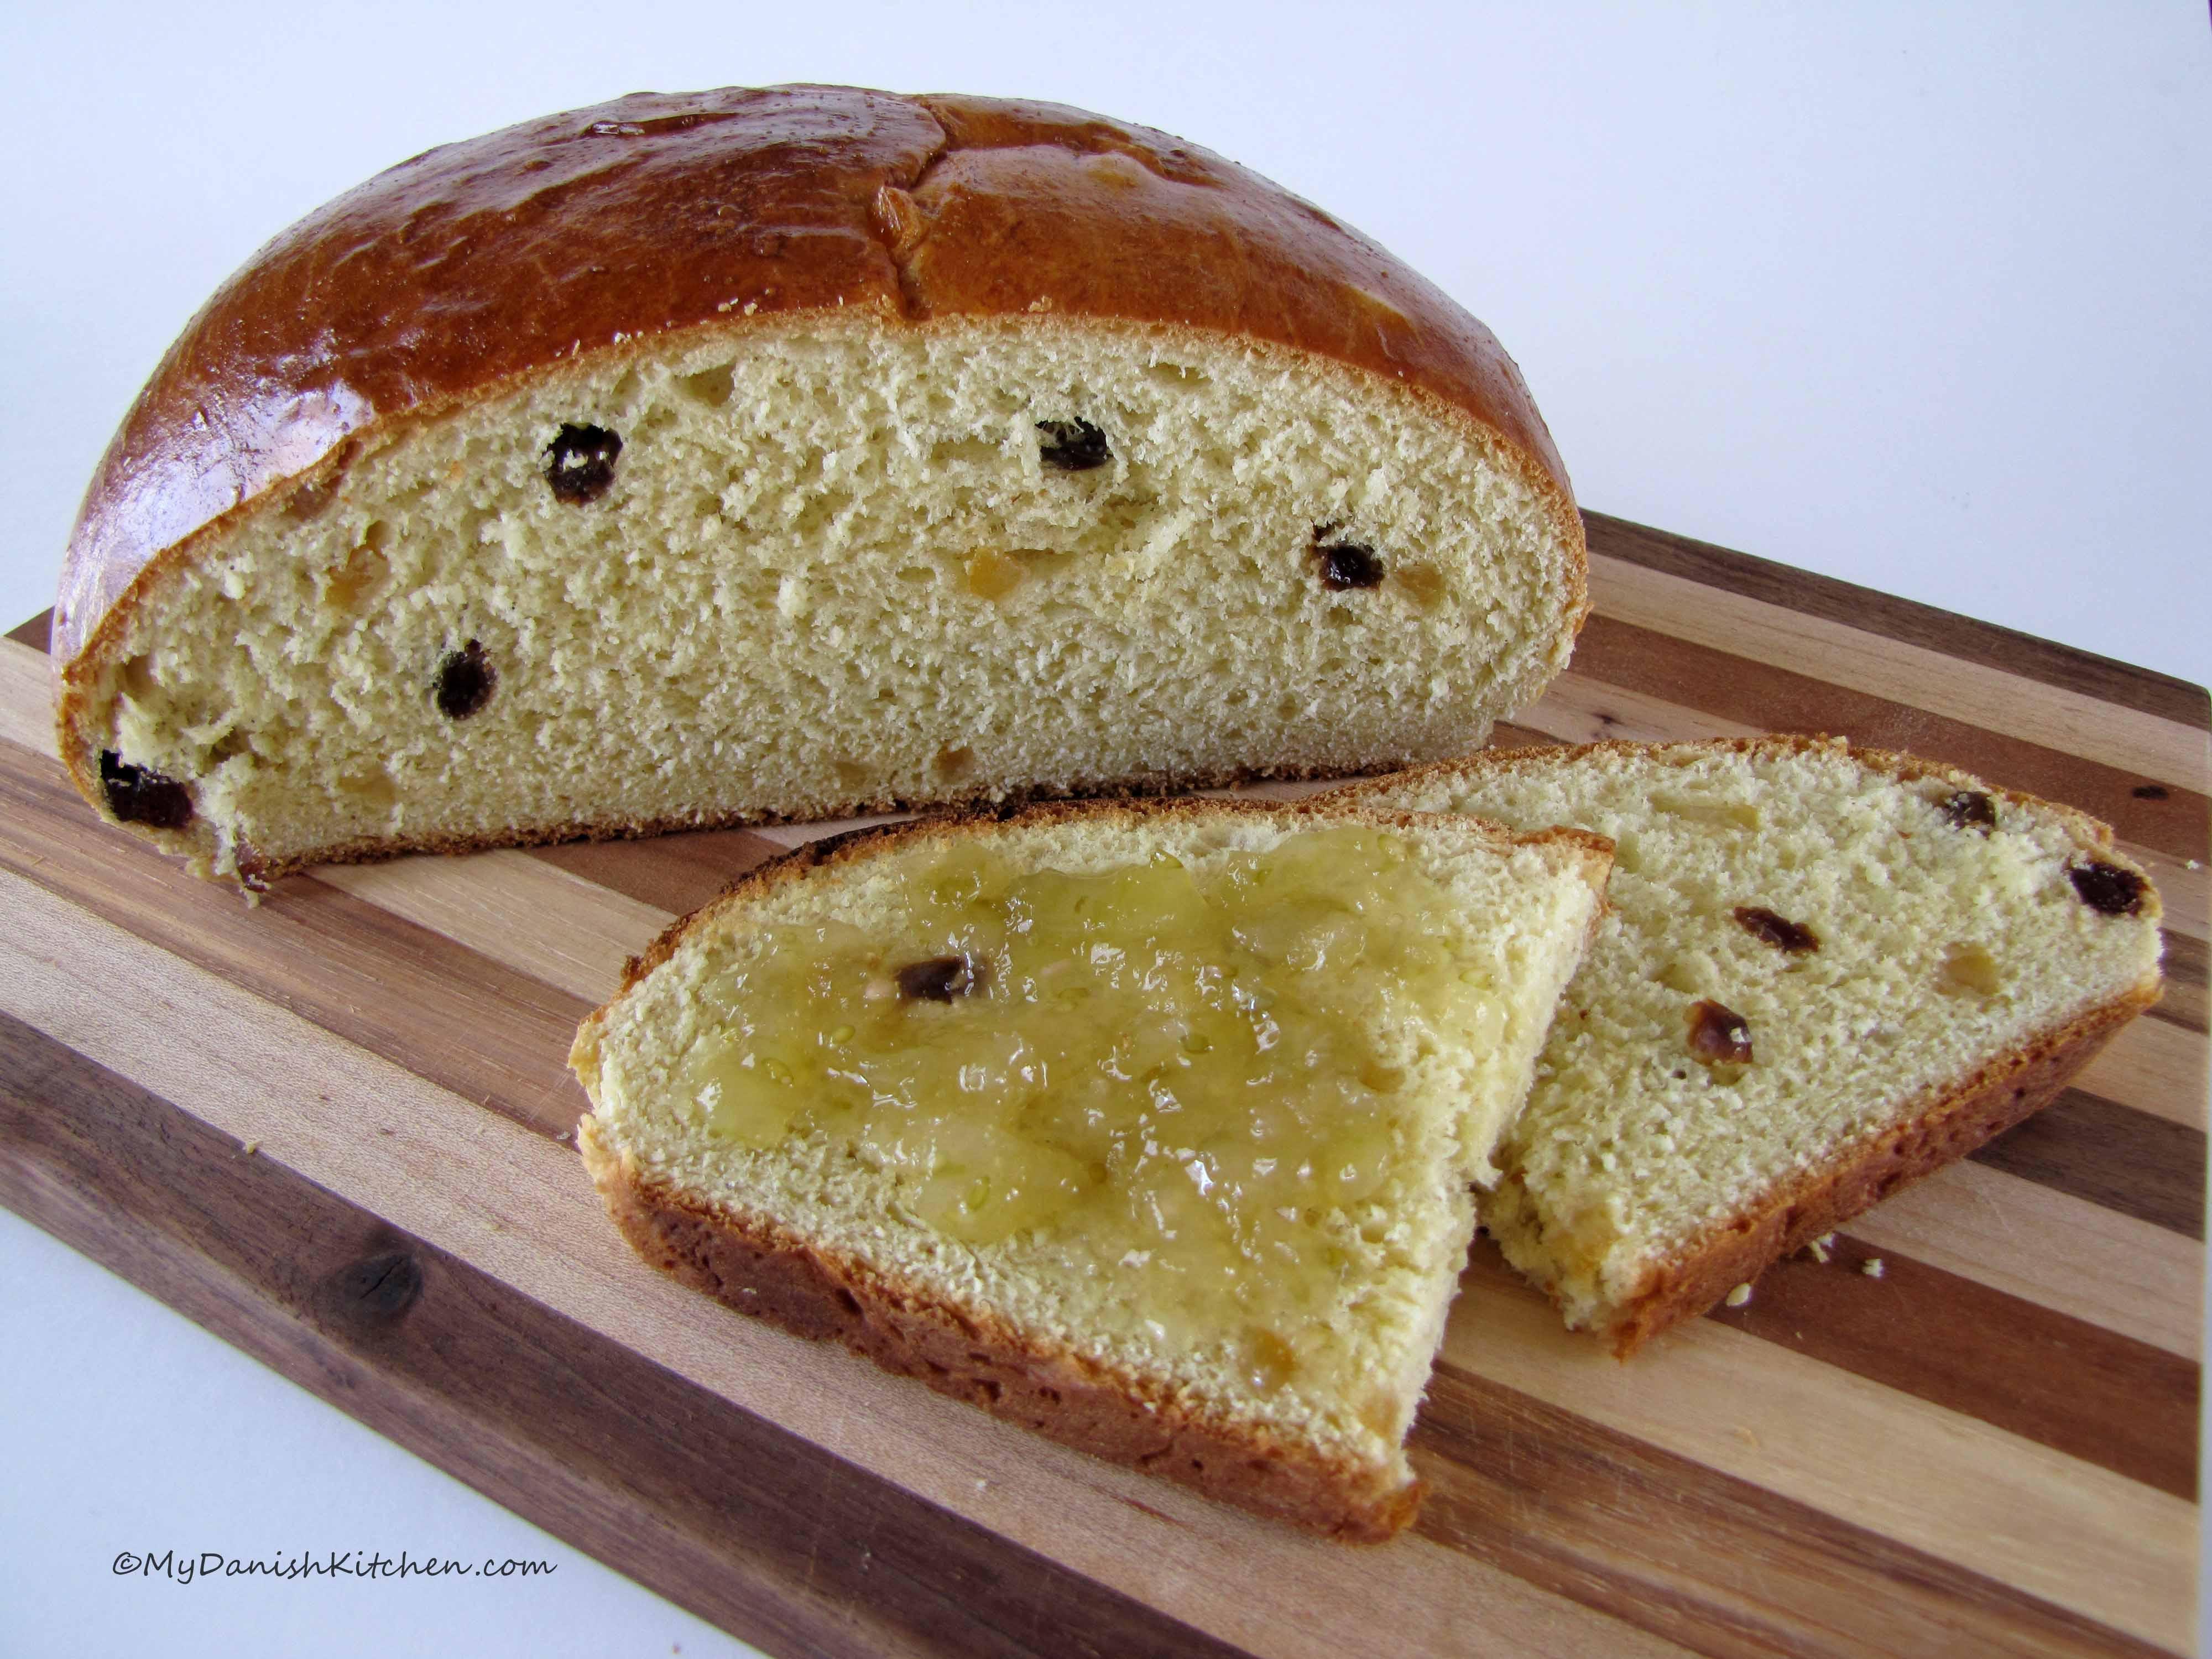 Julekake Norwegian Christmas Bread Recipe  Julekake – Norwegian Christmas Bread